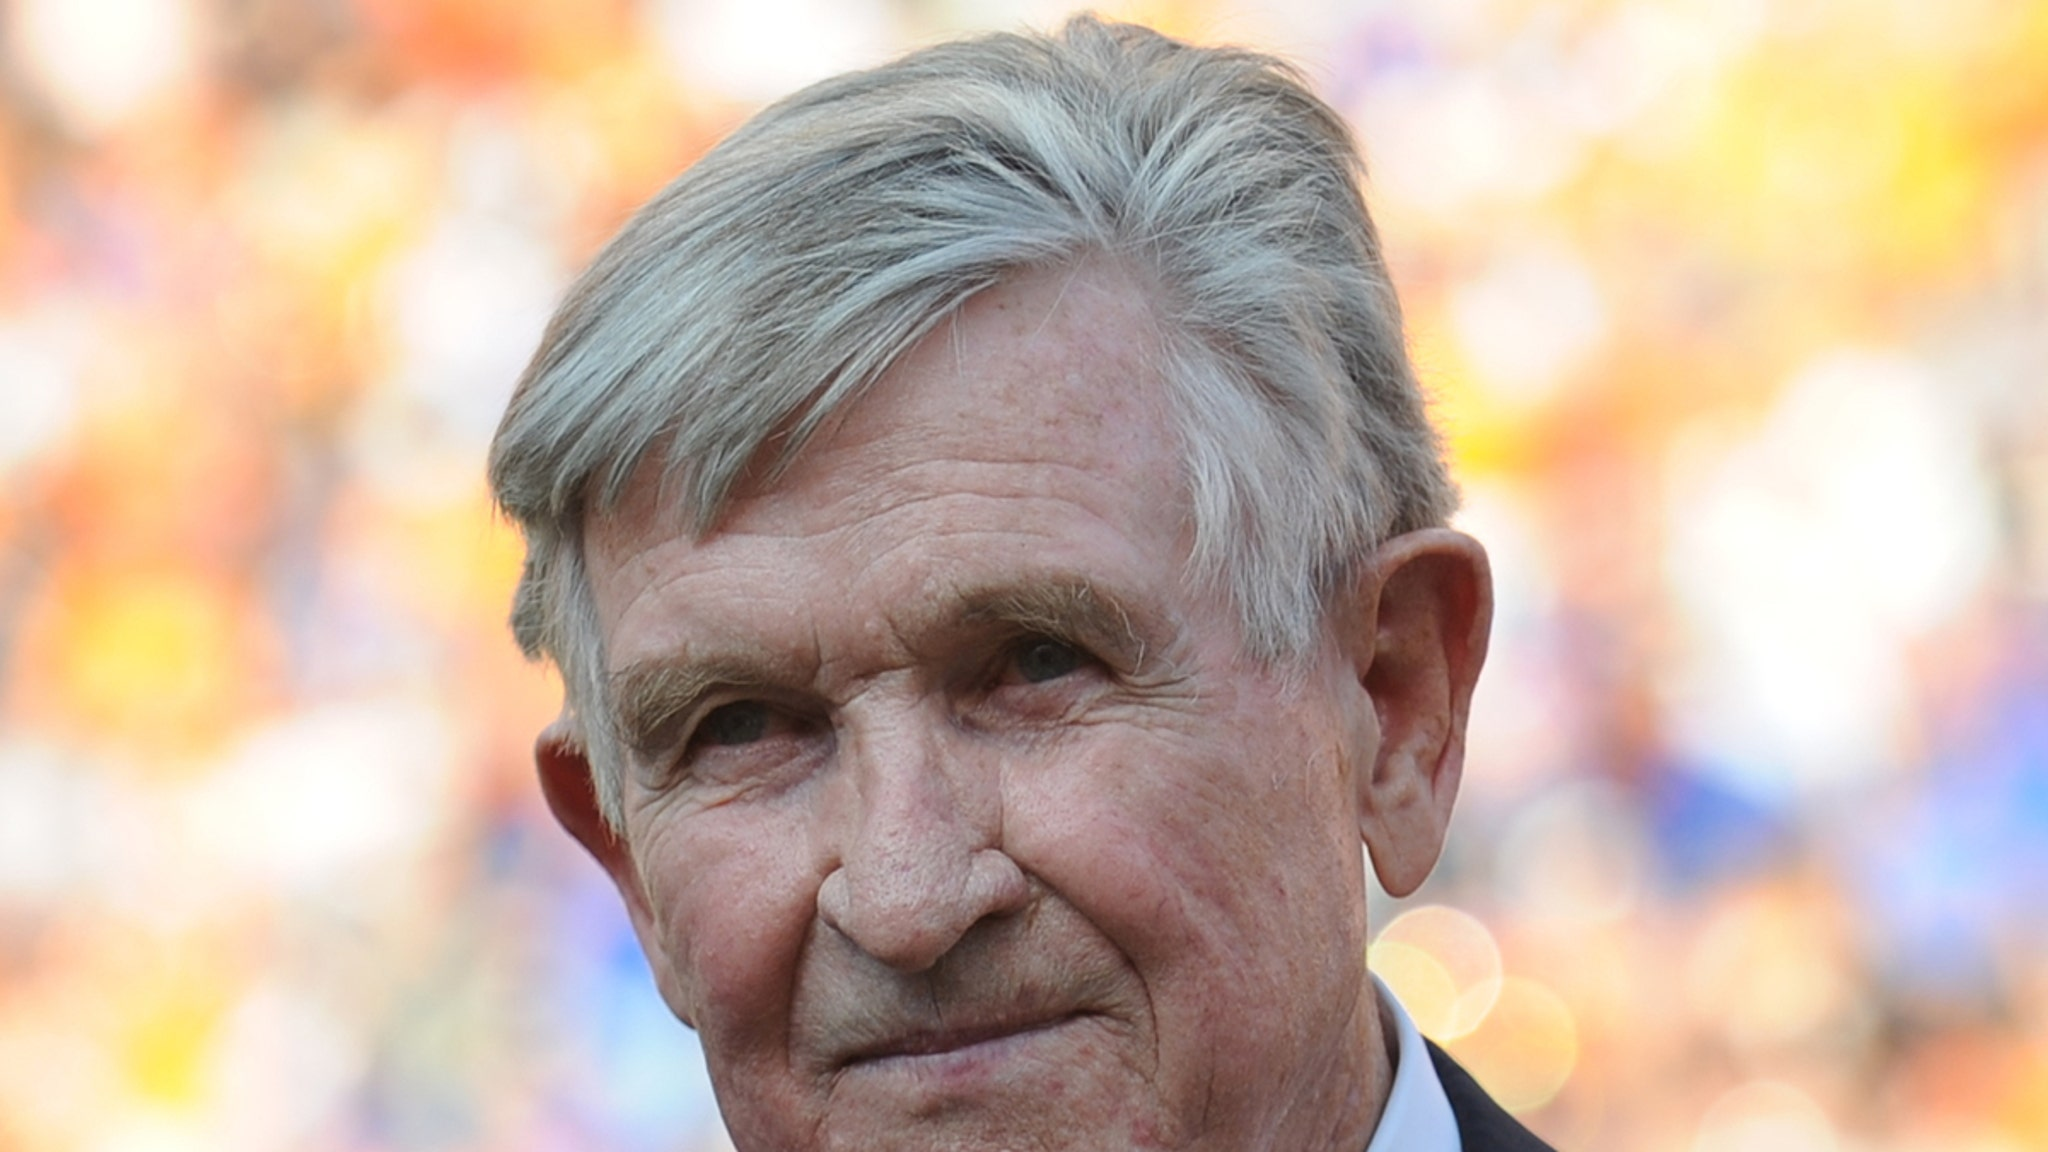 Legendary Tennessee, Pitt Football Coach Johnny Majors Dead At 85